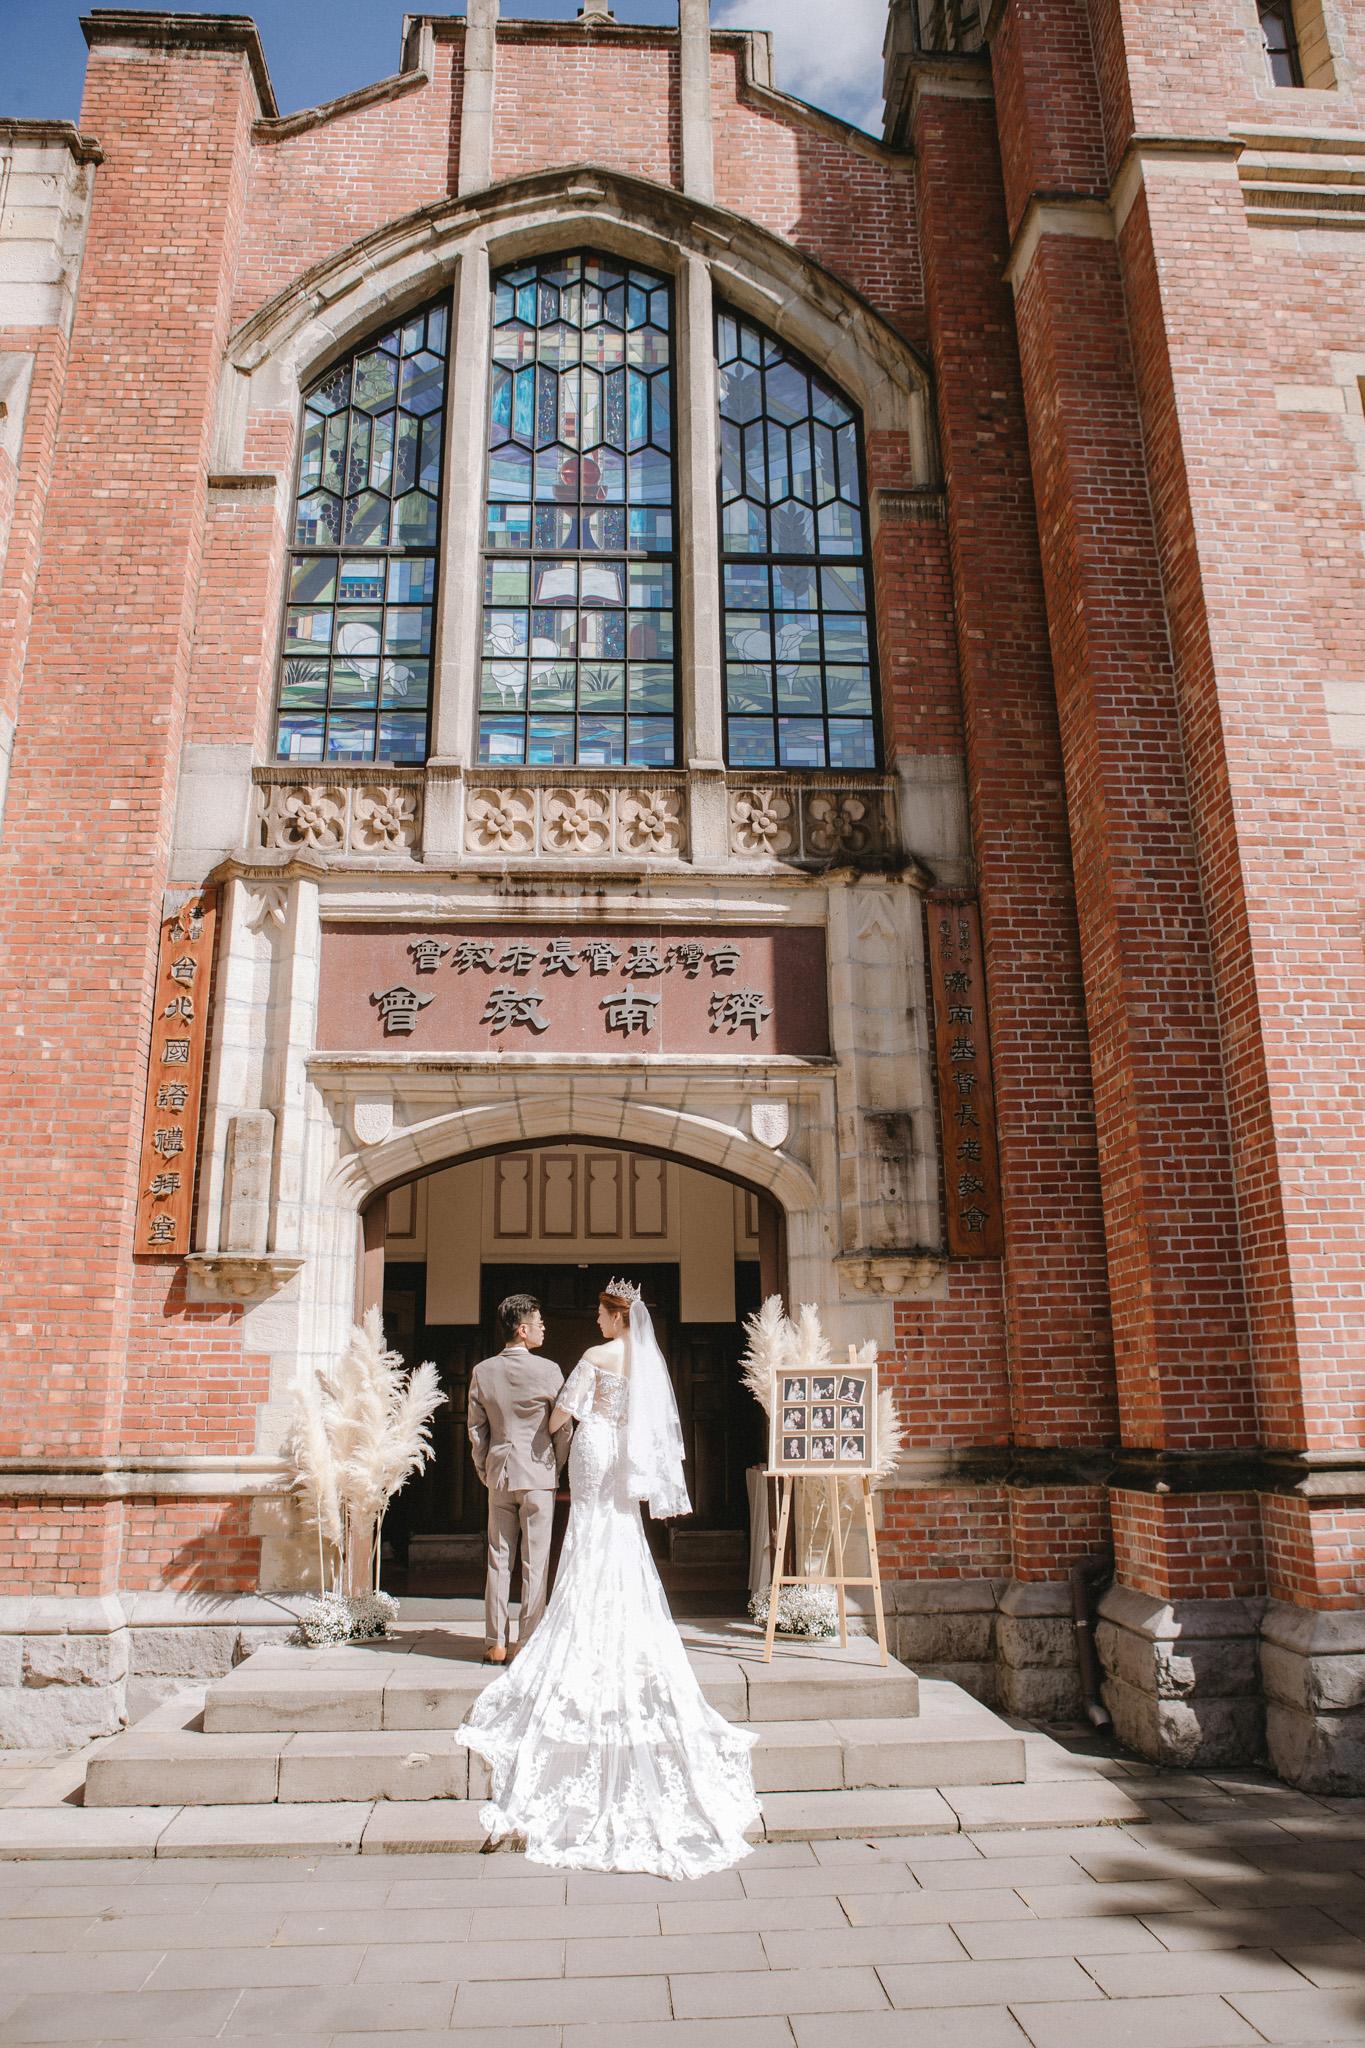 EW 台北婚攝 居米 濟南教會 Brick Yard 33 美軍俱樂部 婚禮 婚宴-21